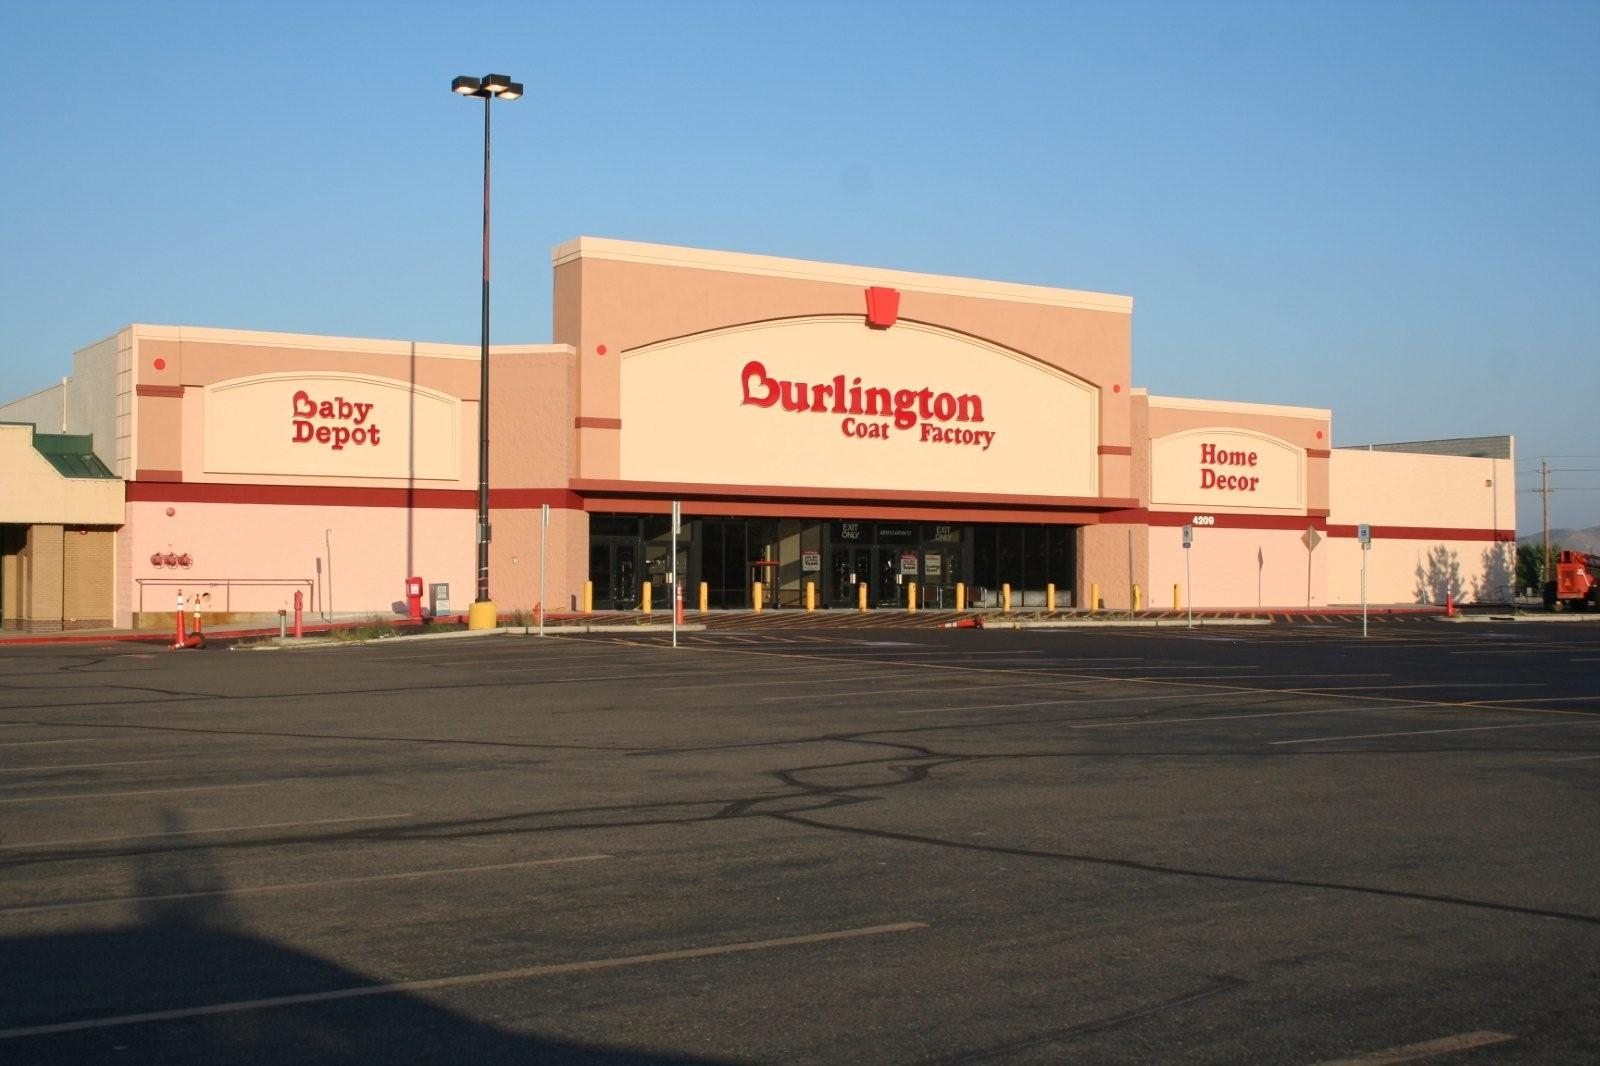 Burlington Coat Factory – Around Carson Regarding Burlington Coat Factory Wall Art (Image 5 of 20)